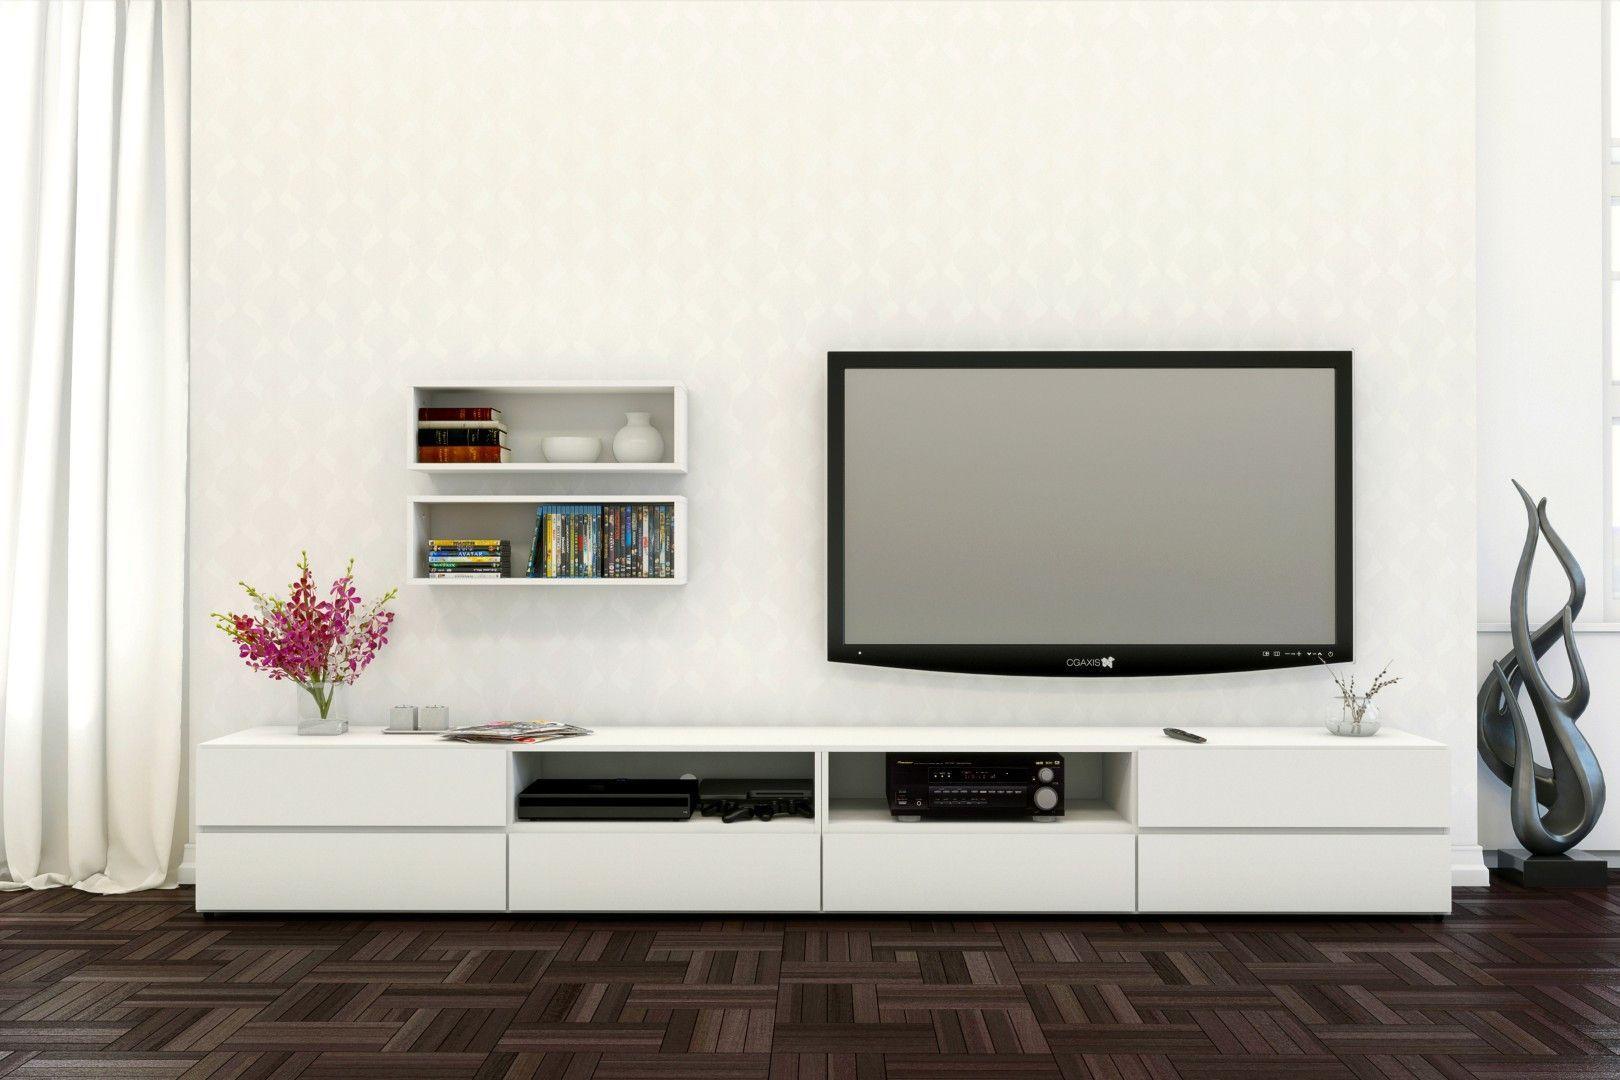 nexera furniture website. Nexera 400526 Blvd Entertainment Set This Comes In A White Lacquer/melamine Finish. Furniture Website